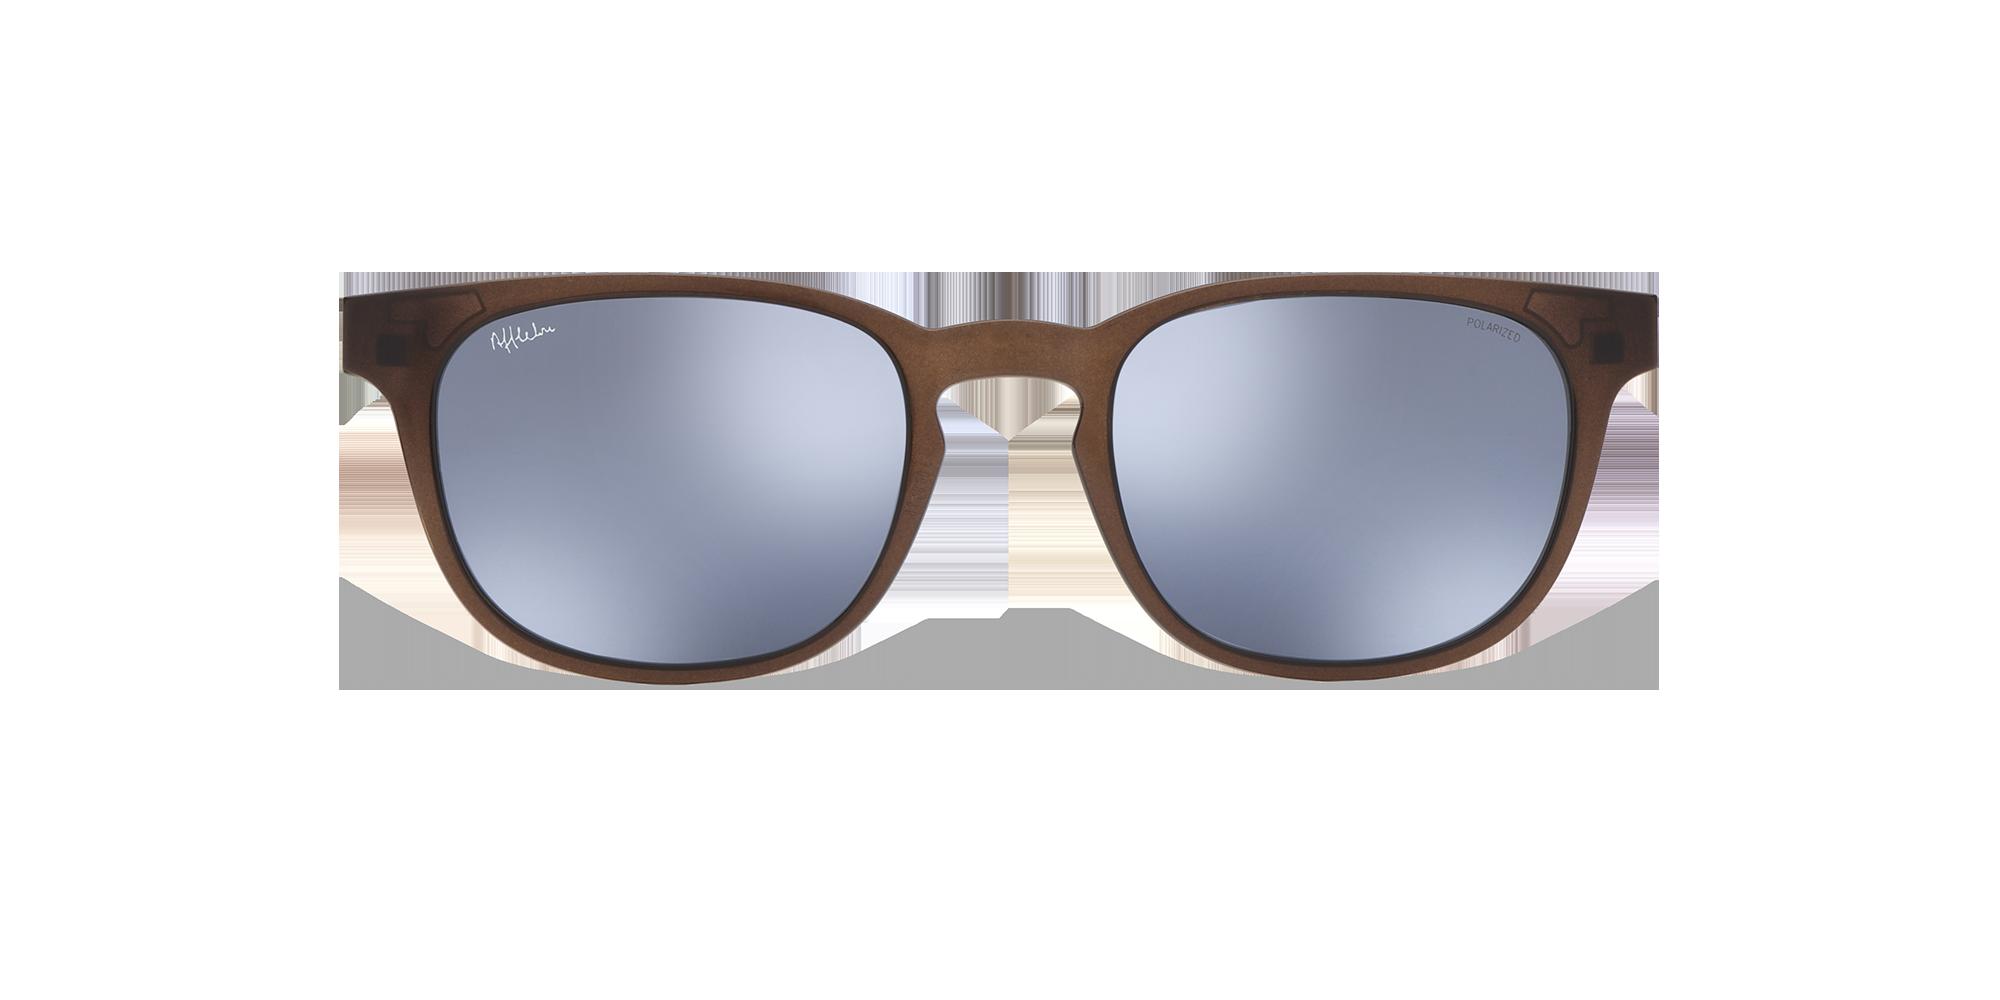 afflelou/france/products/smart_clip/clips_glasses/TMK33PRGY015120.png